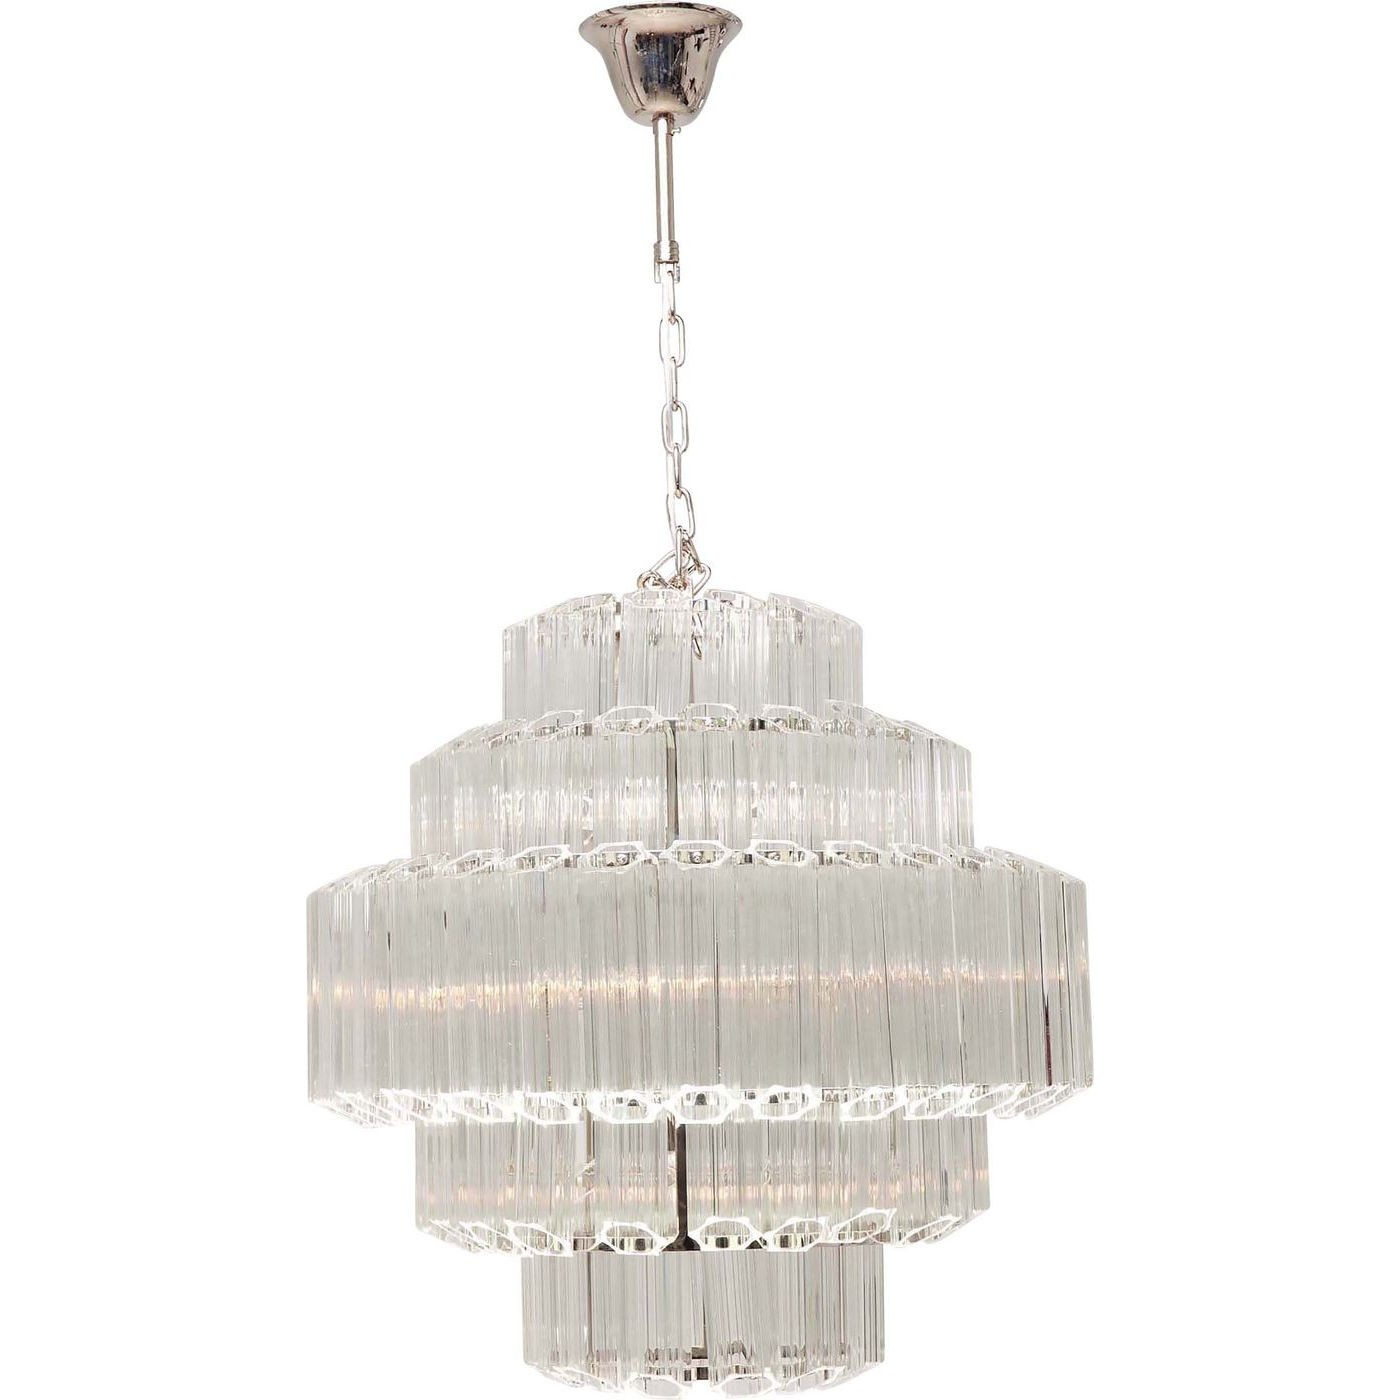 Loftlampe Palazzo Ø66 cm